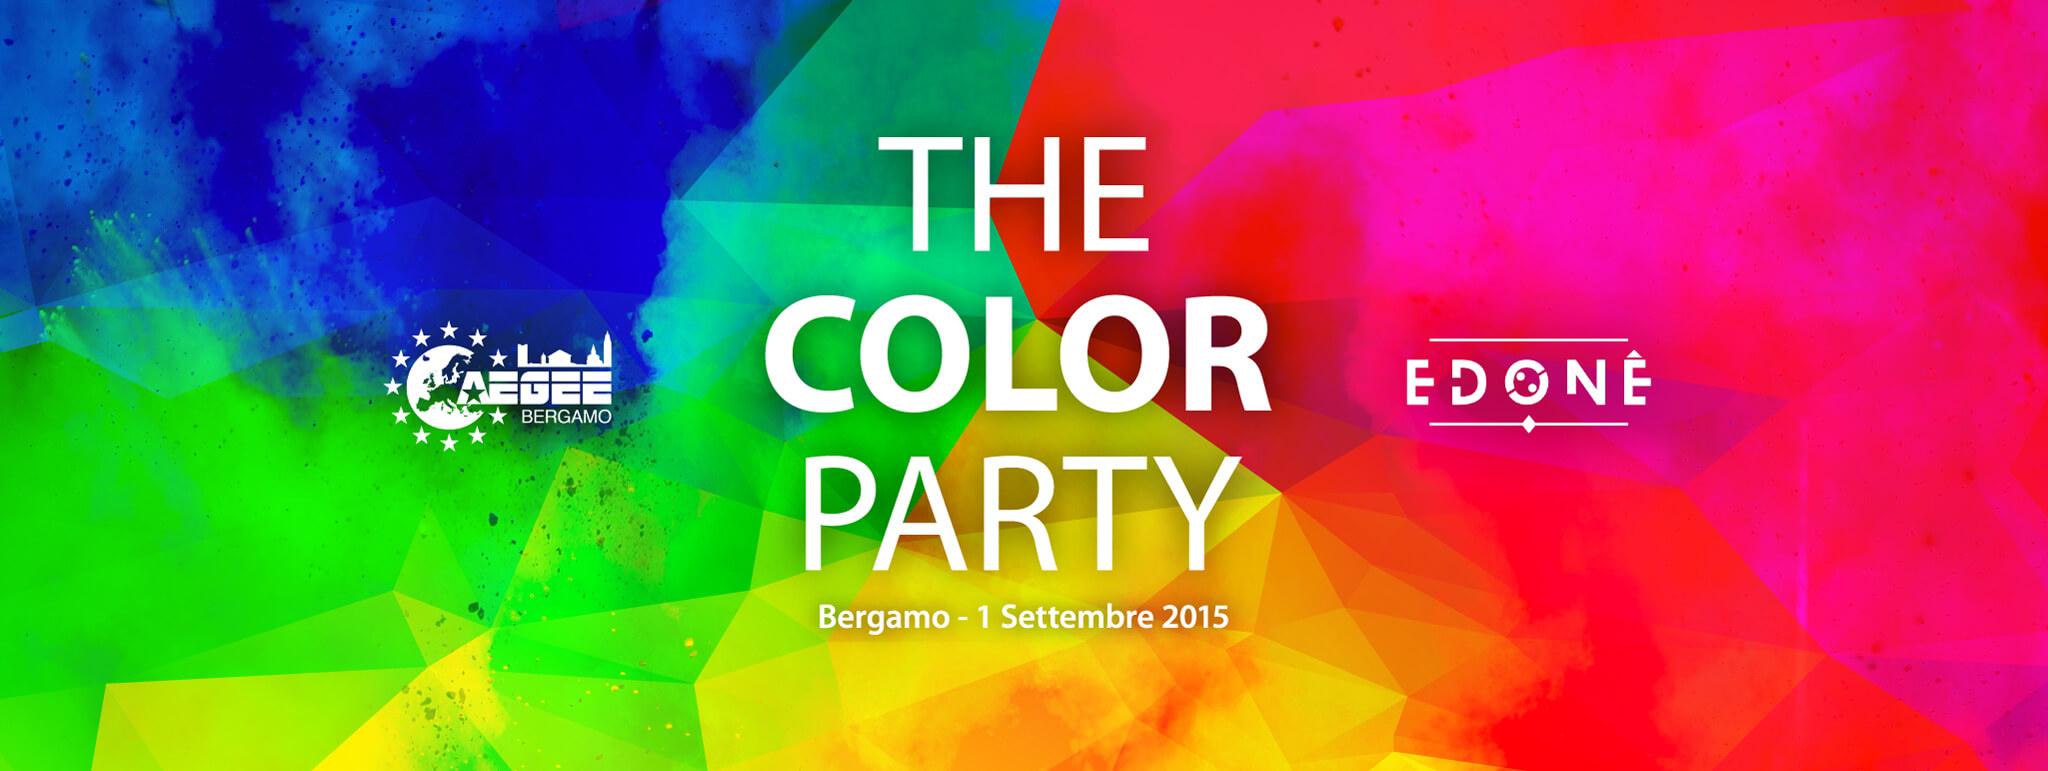 THE COLOR PARTY - Closing Summer Edition | AEGEE-Bergamo